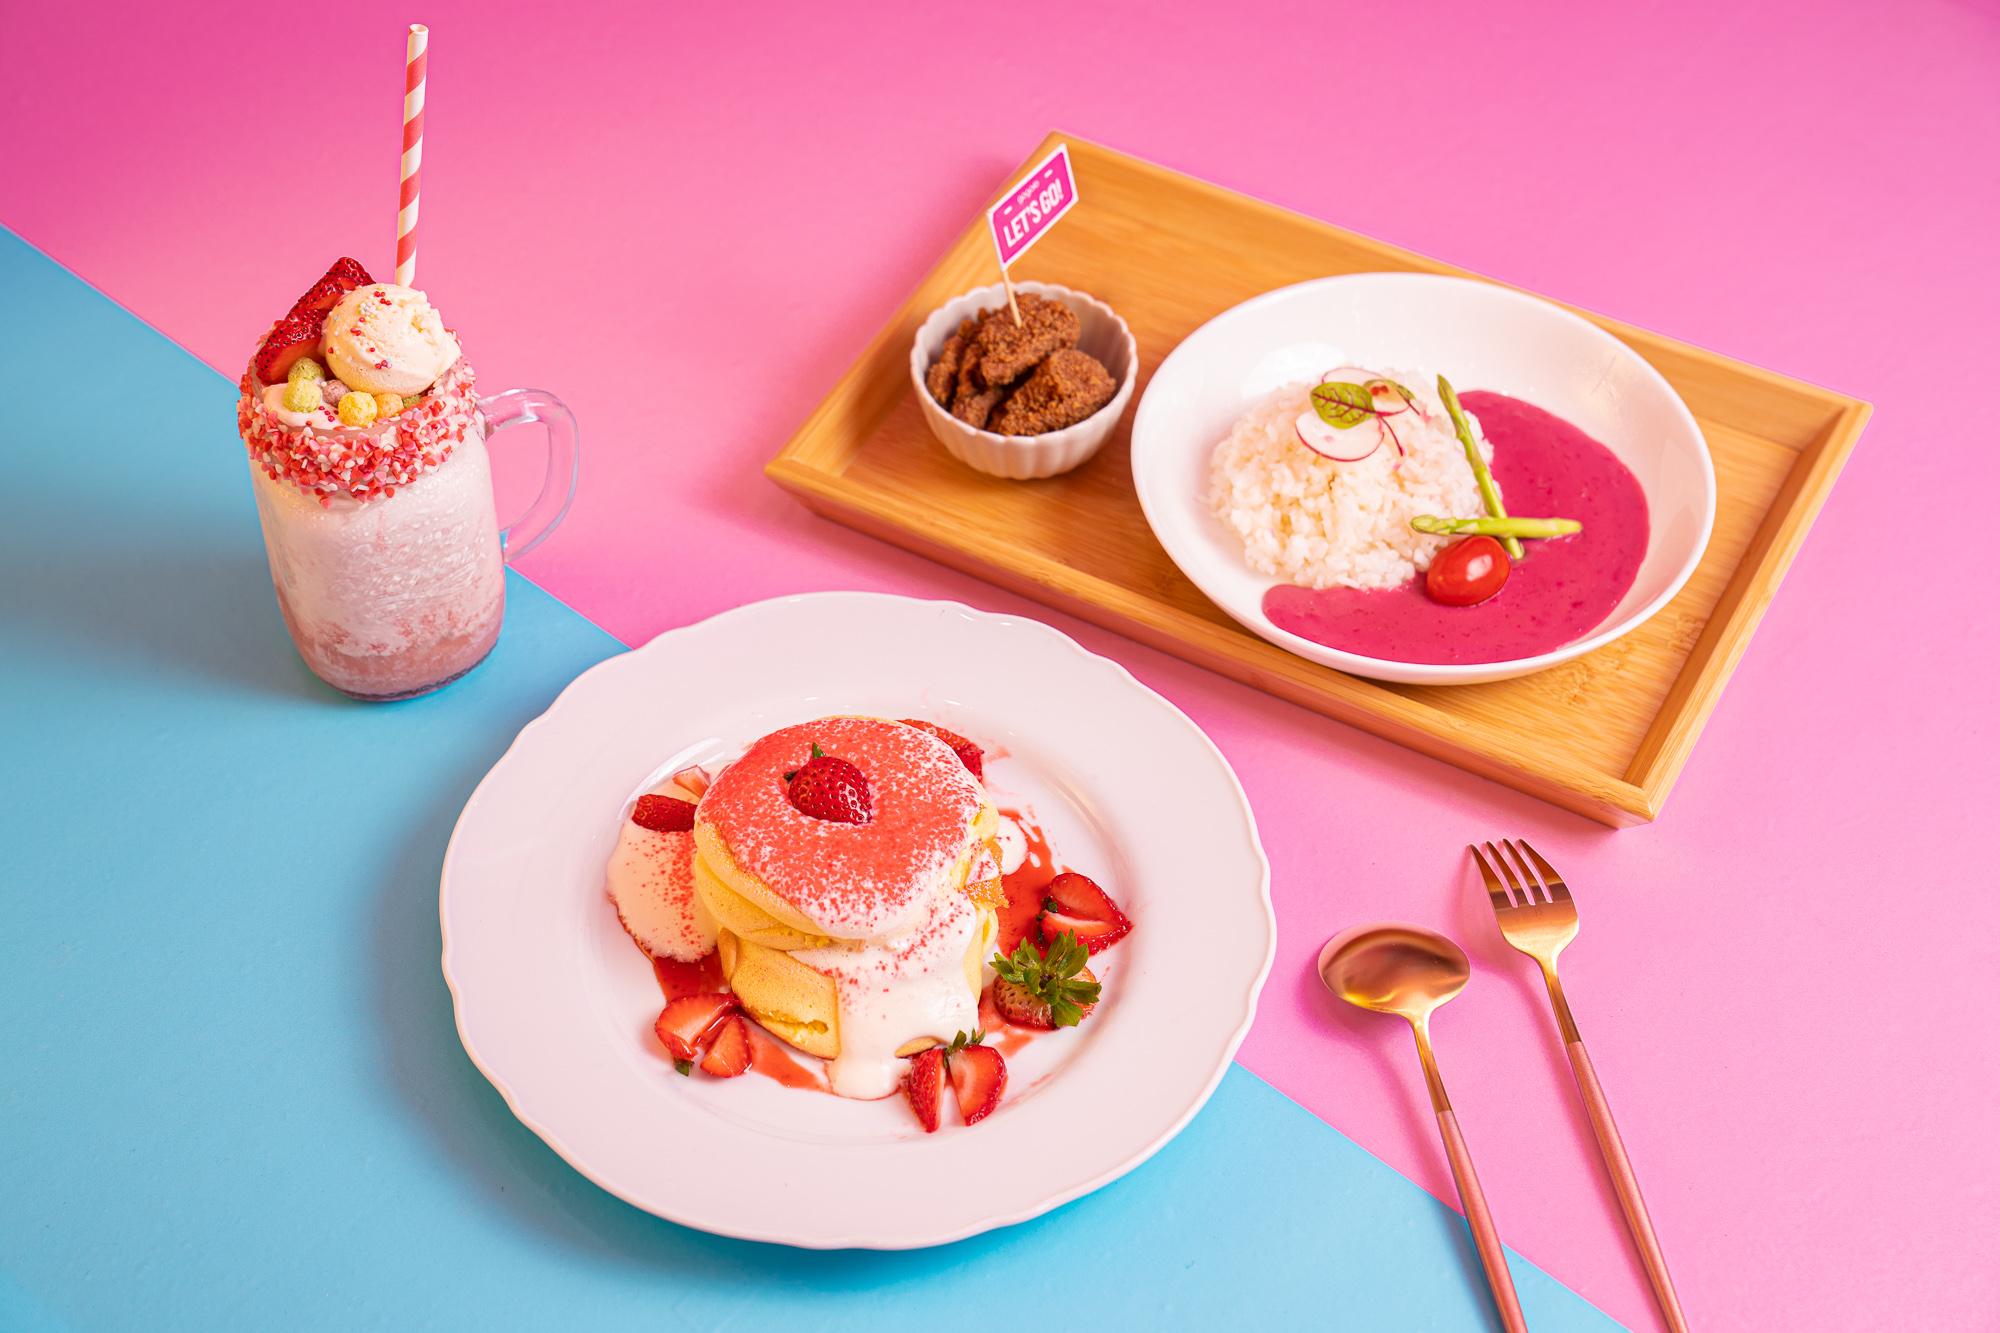 Gogoro 與知名 Boogoo Café 布咕咖啡和深夜裡的法國手工甜點合作,推出 Gogoro Piiink系列客製飲品和甜品。